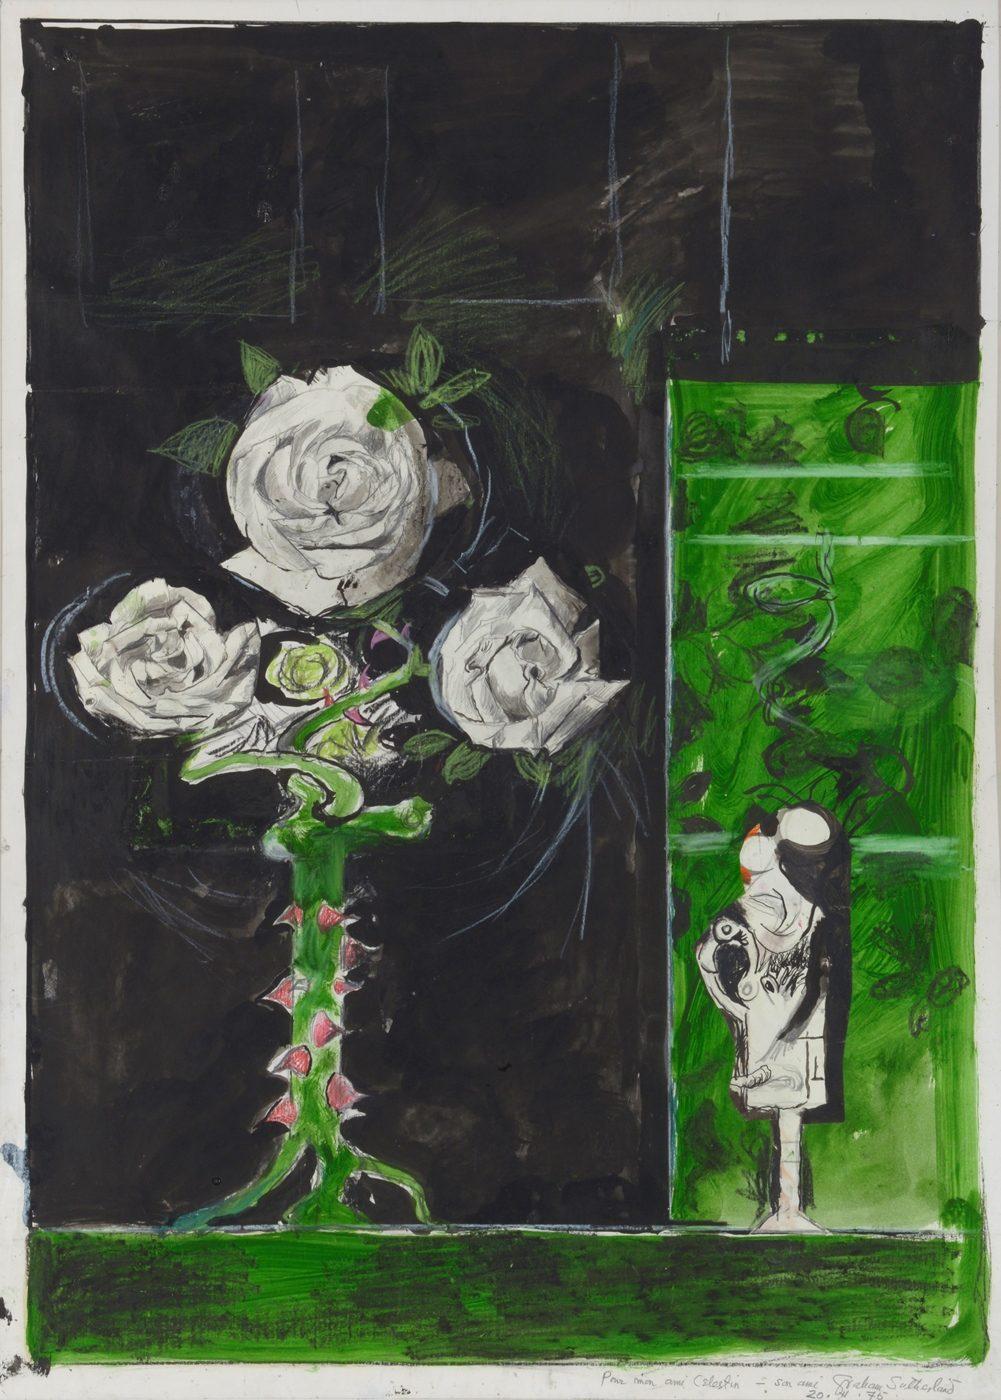 Graham Sutherland, OM (1903-1980), Roses